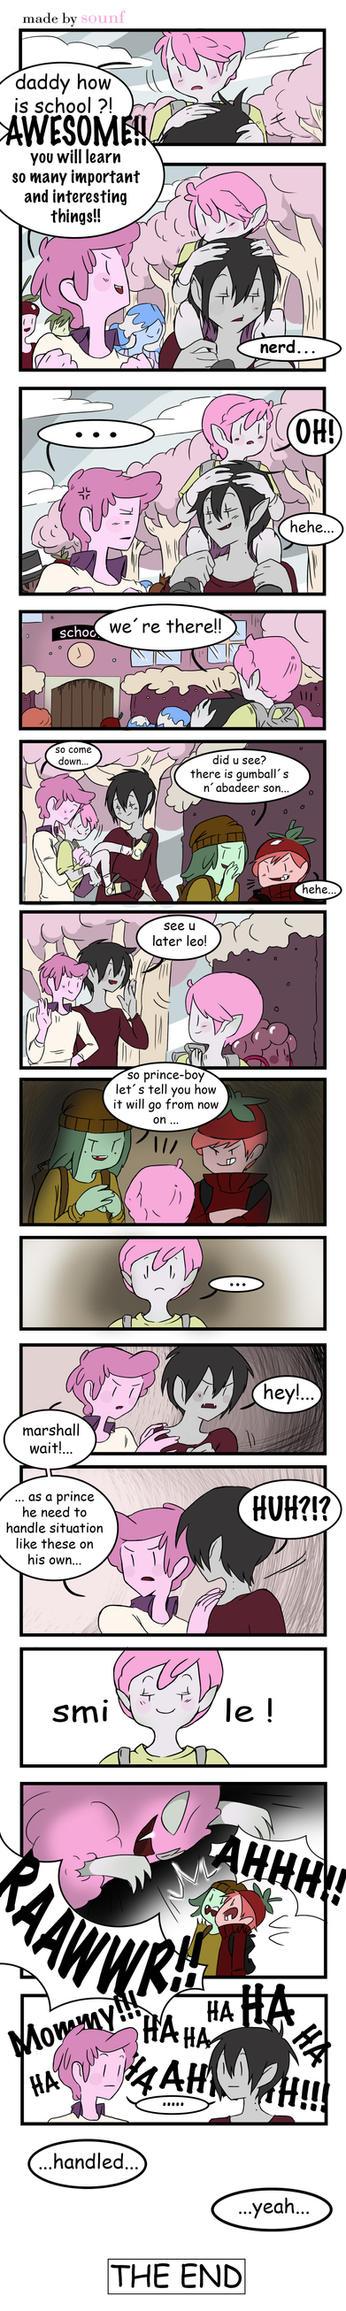 comic 7 by sounf